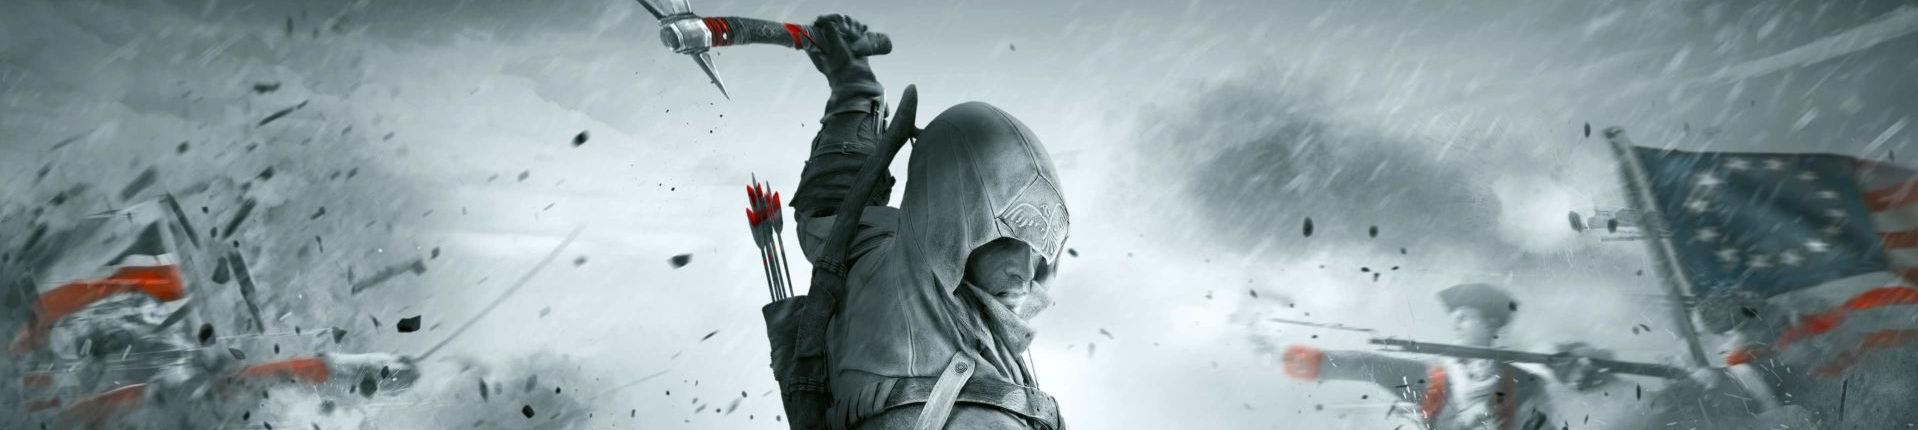 <a href='https://www.mightygamesmag.de/all-game-list/assassins-creed-iii-remastered/'>Zum Spiel</a>